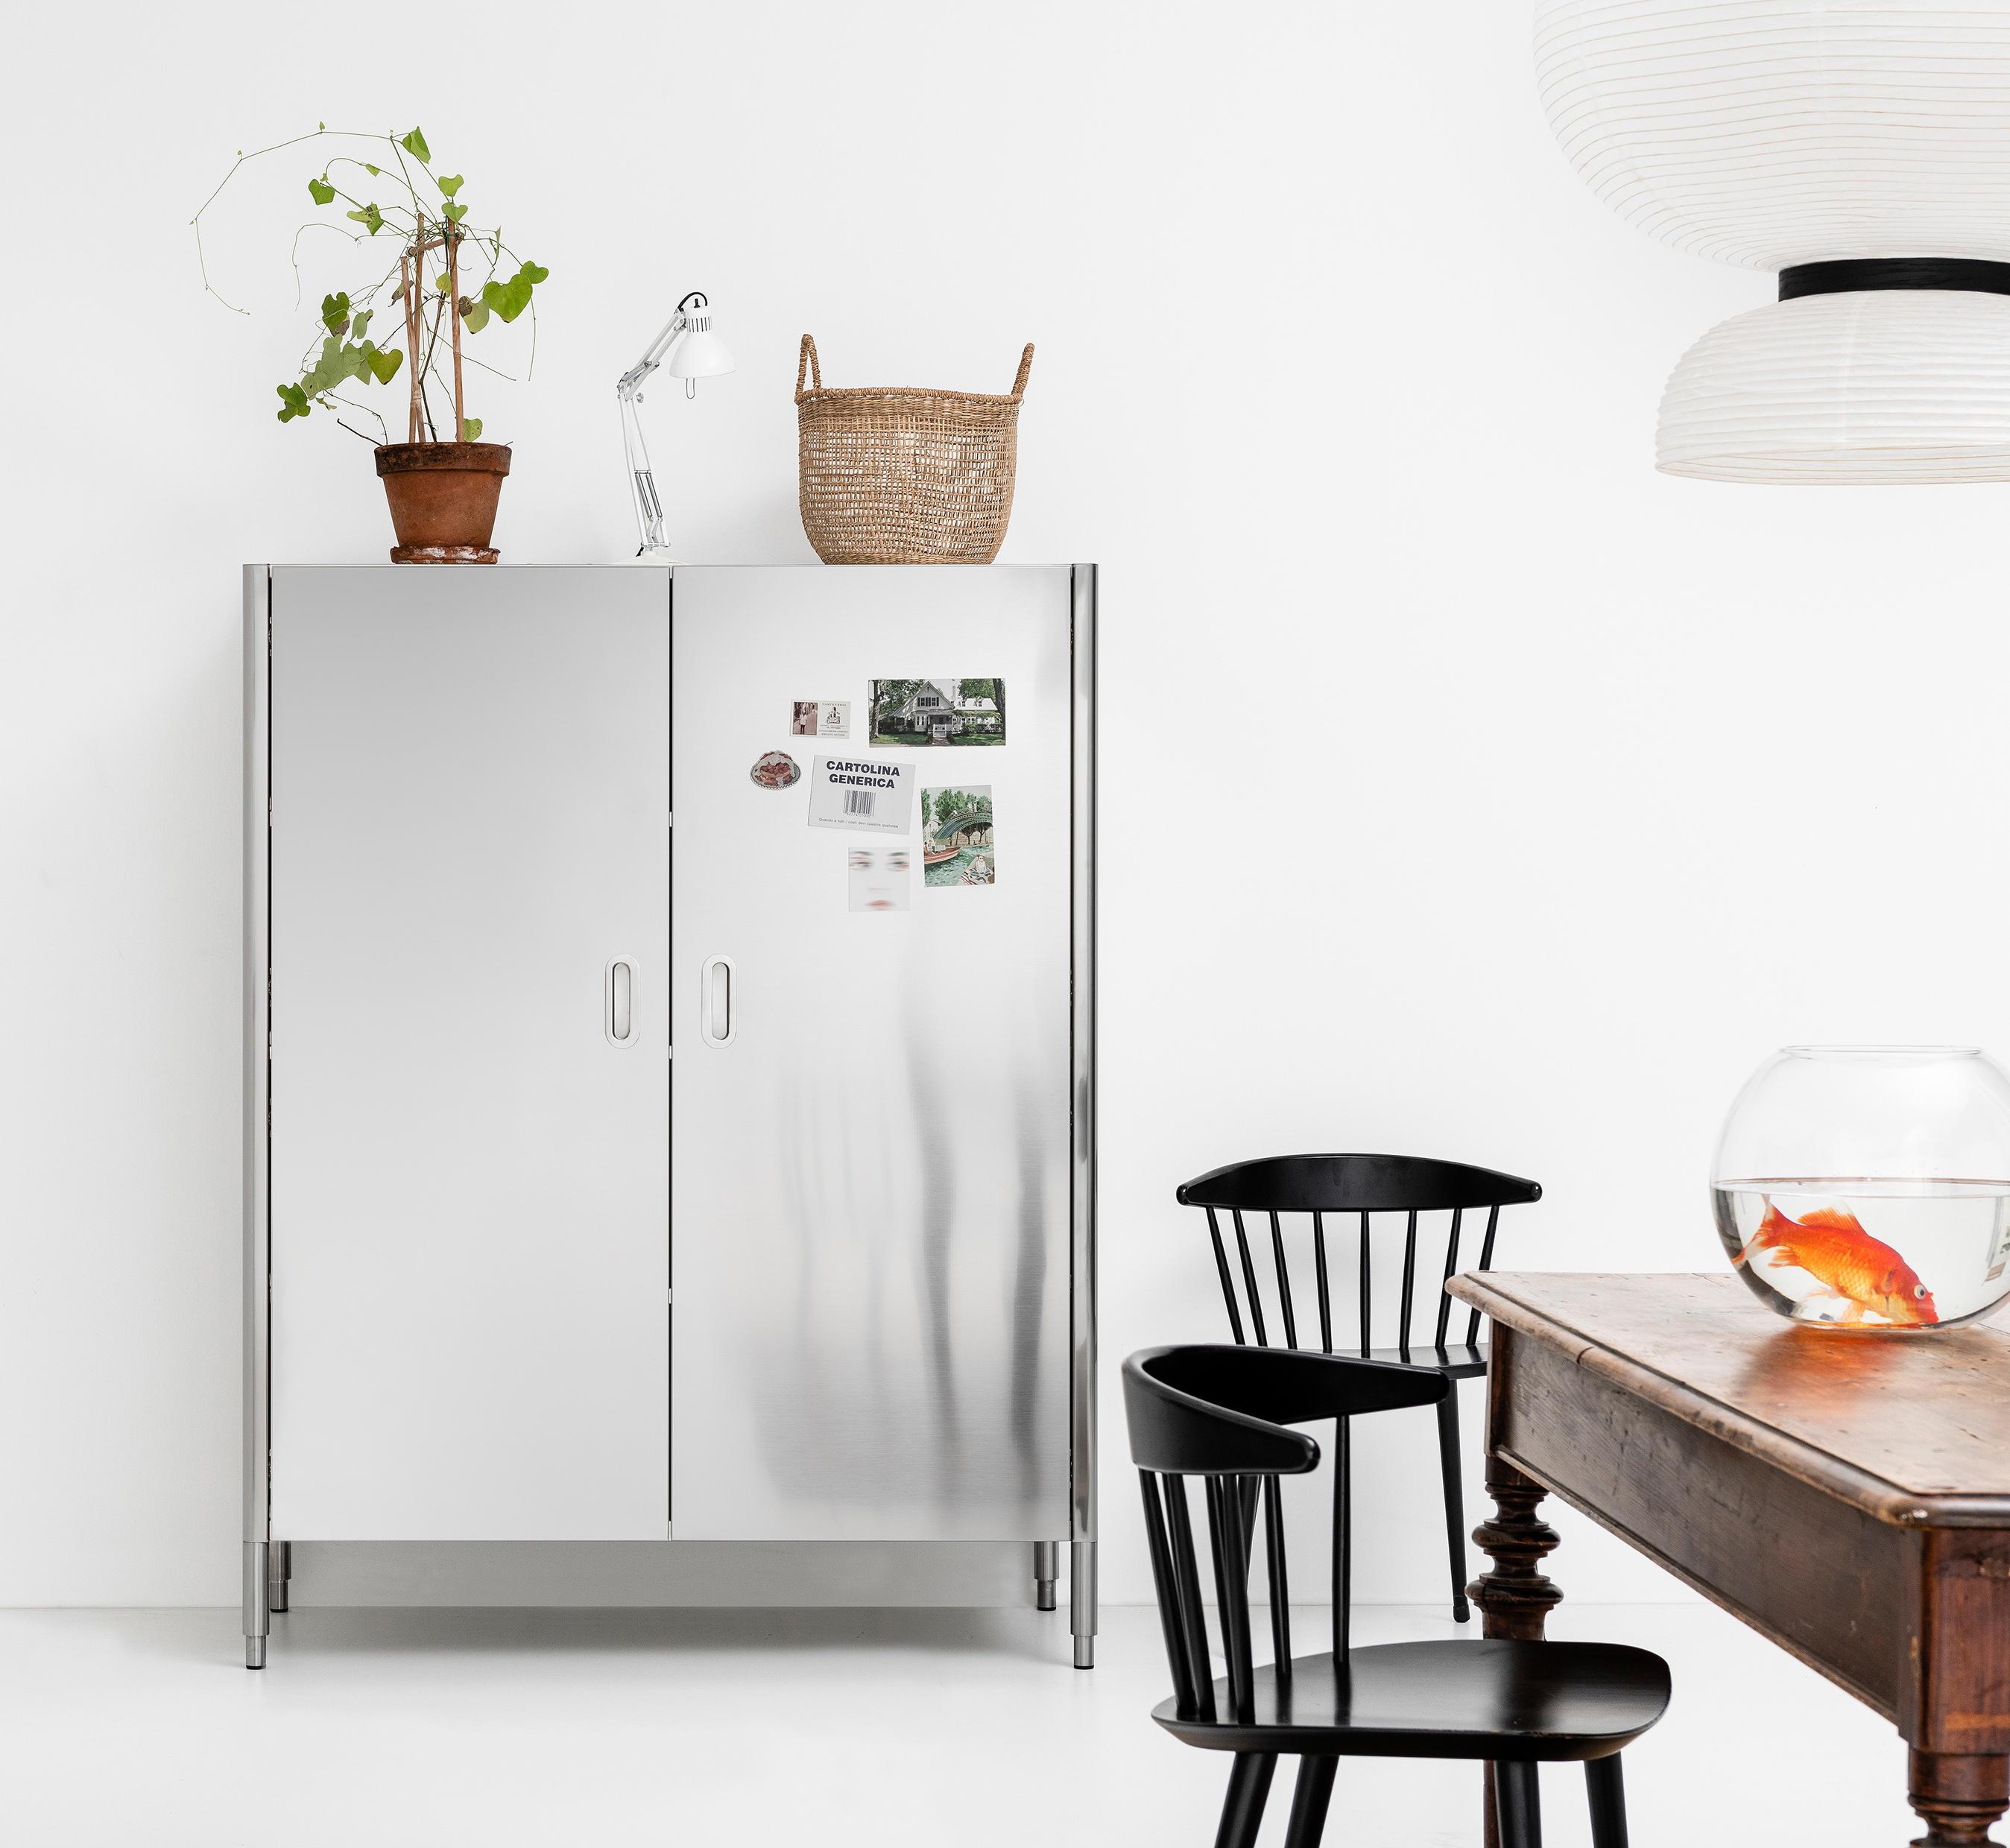 Colonna Dispensa Cucina Ikea stir it up: alpes-inox's liberi in cucina system